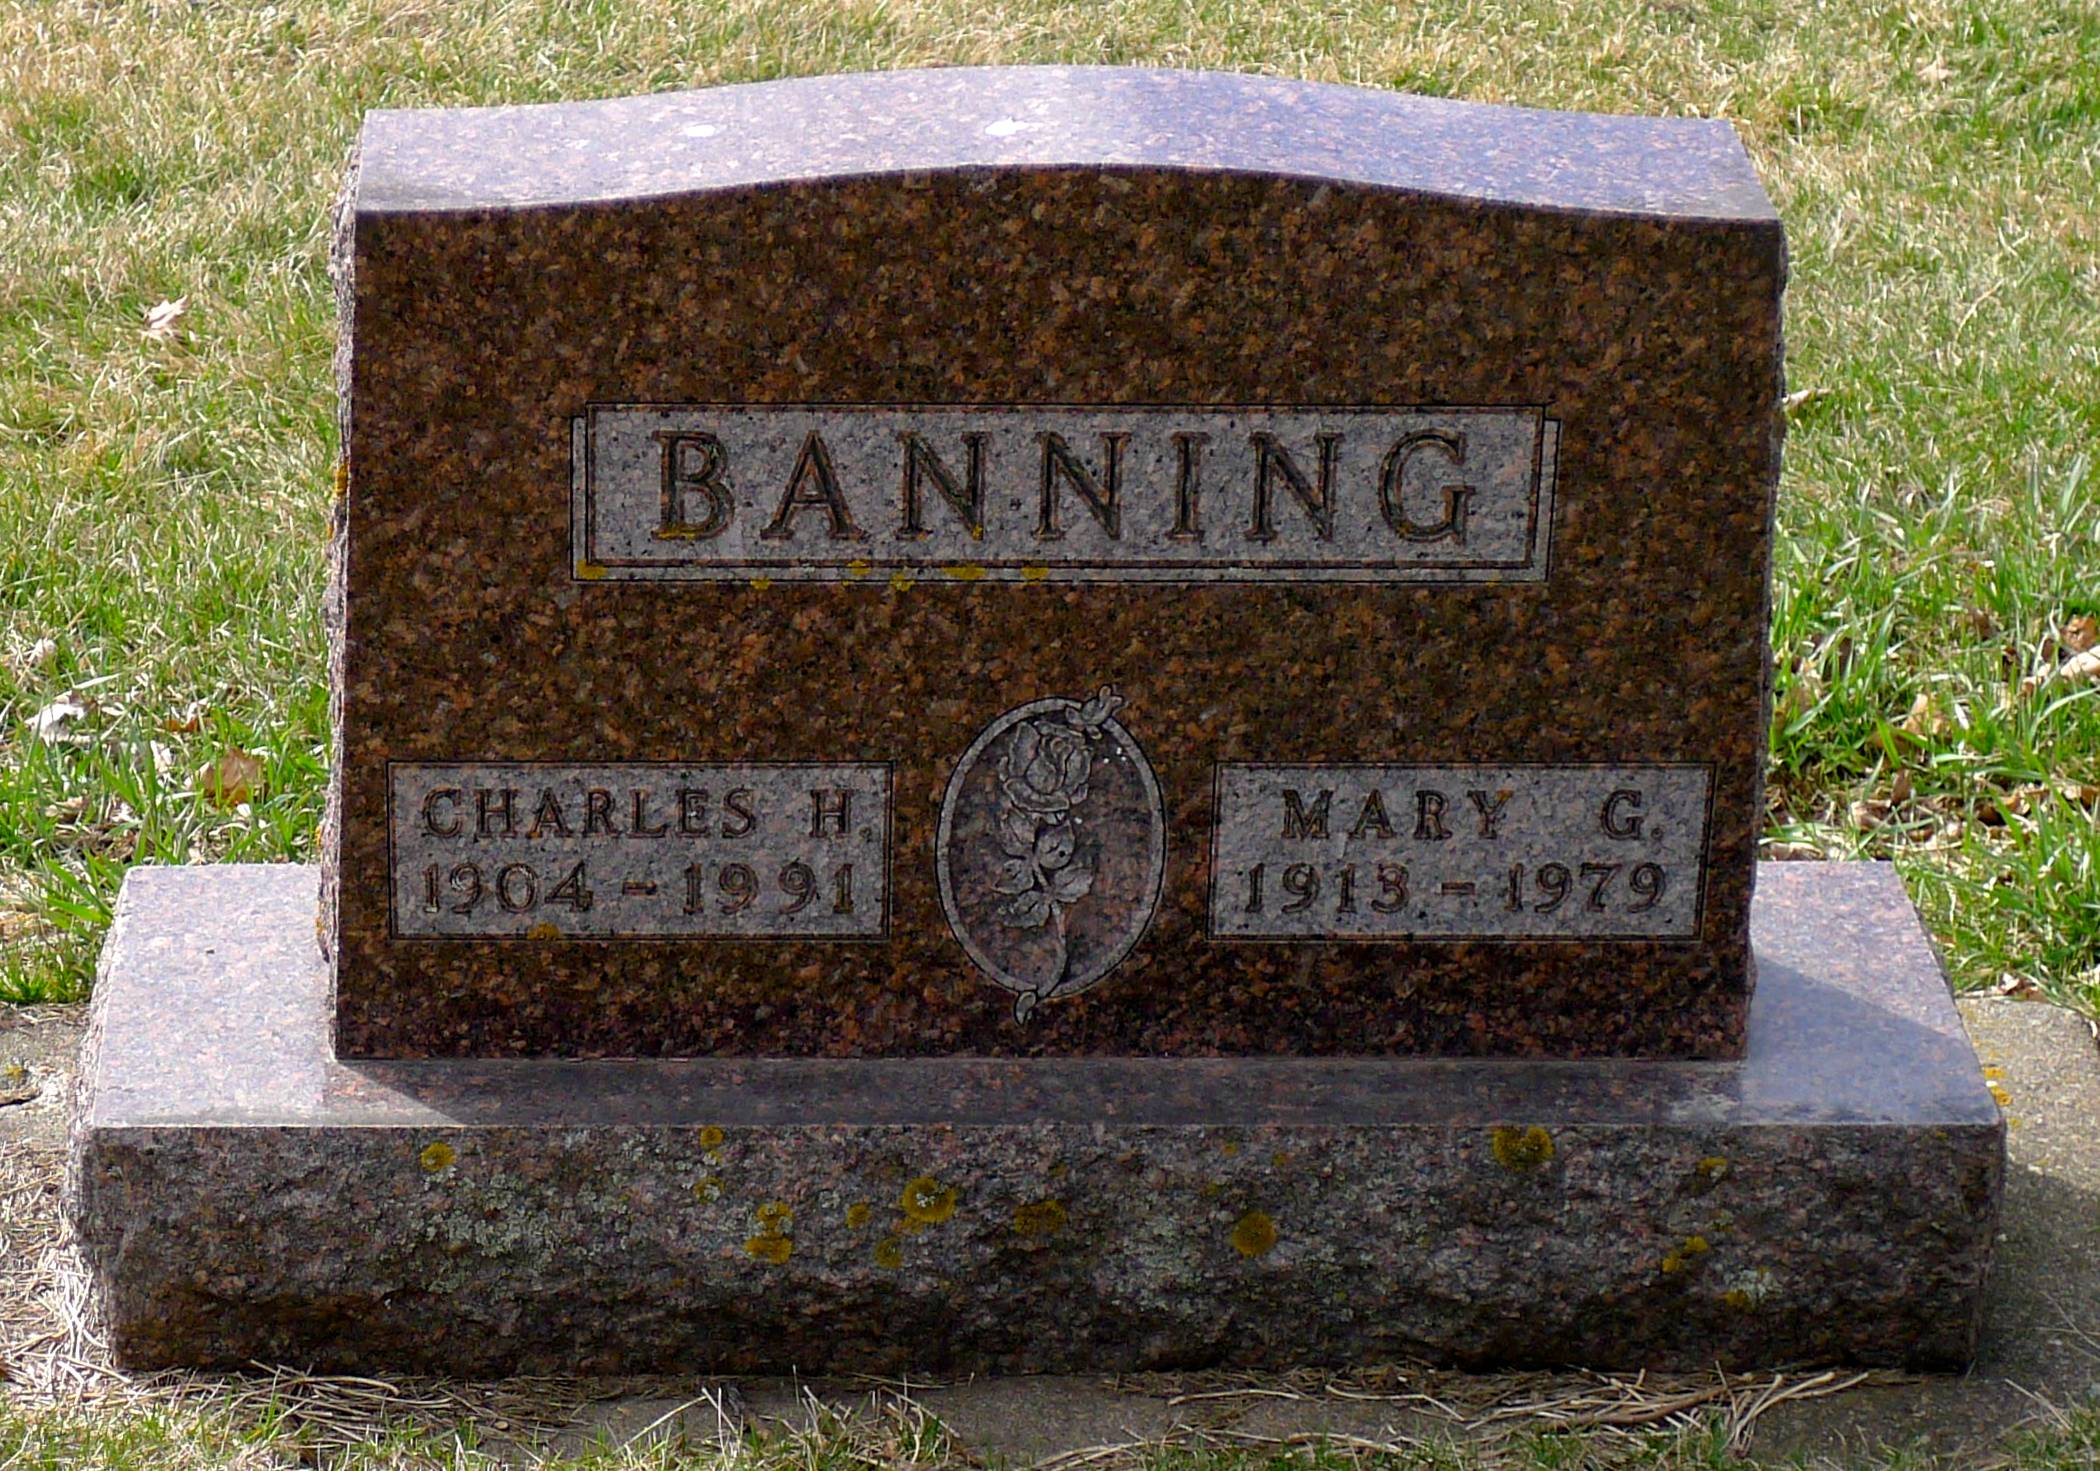 Charles Henry Banning